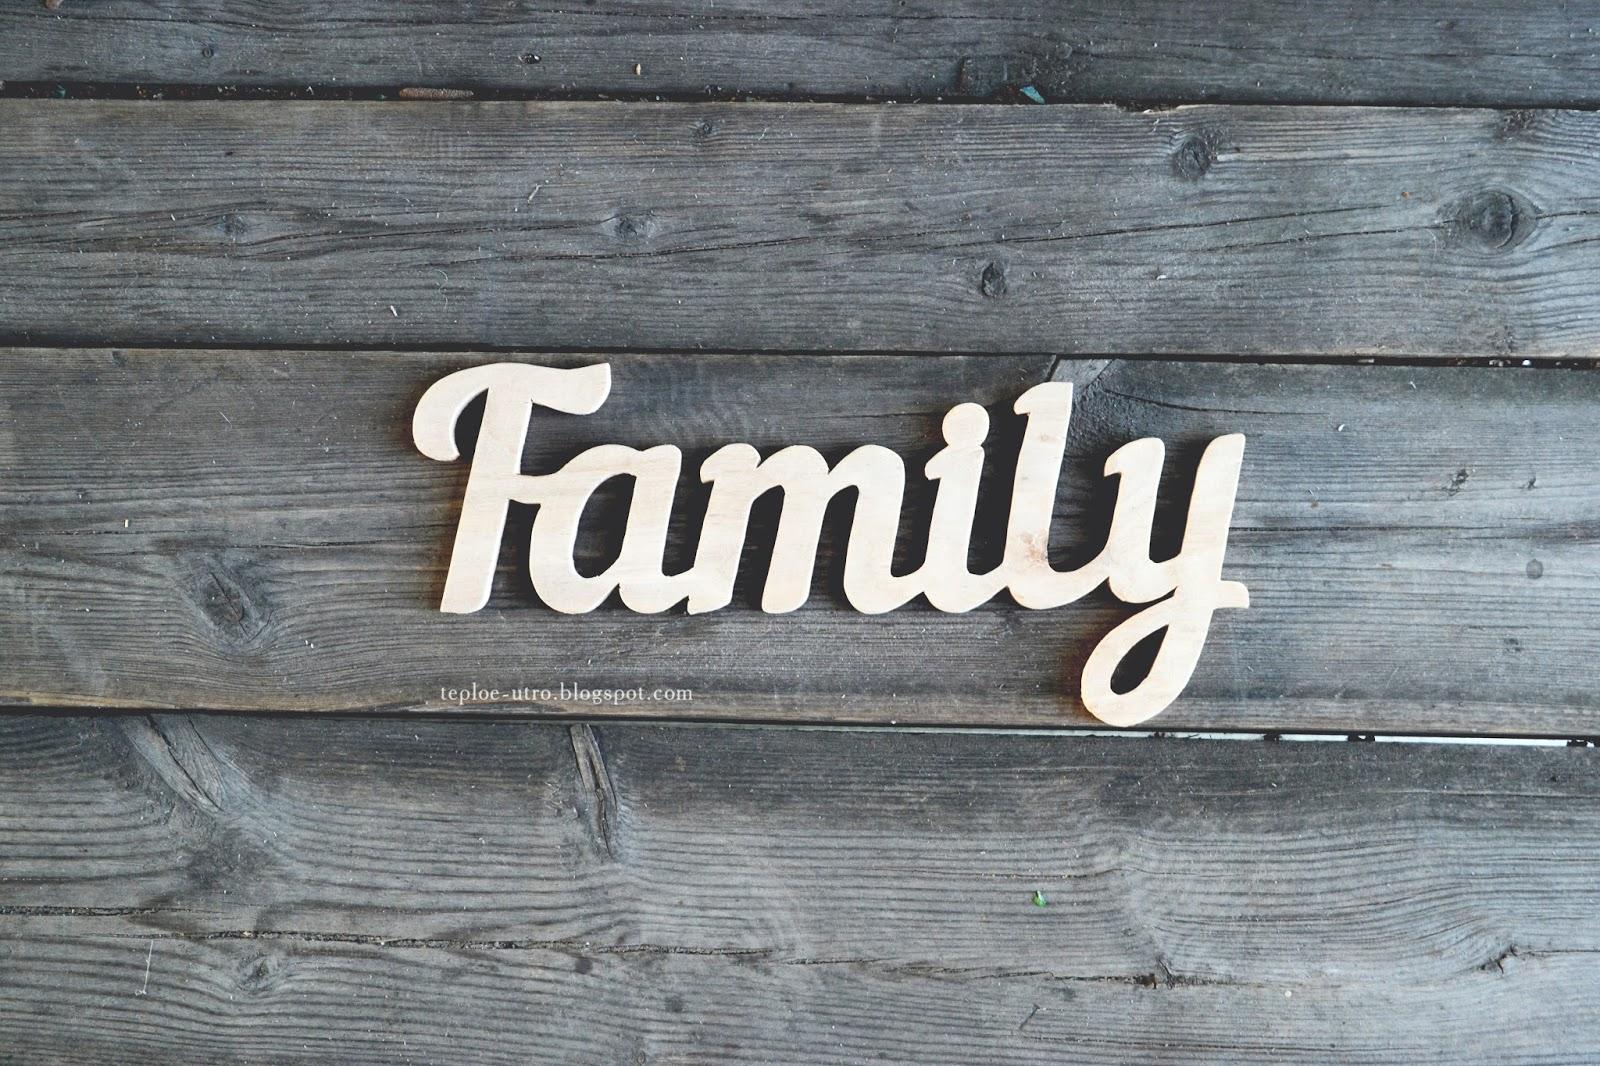 фото семья надпись